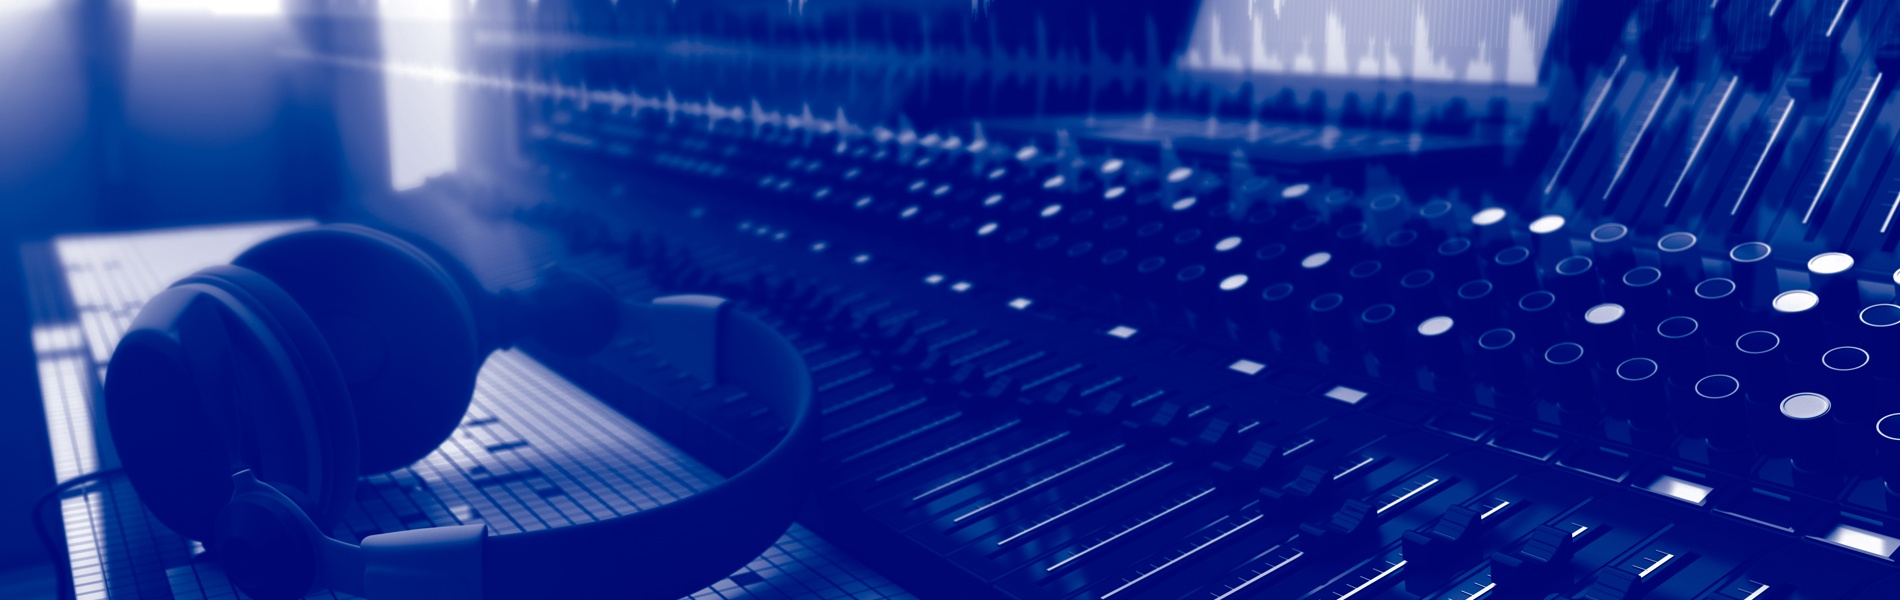 modernizingmusicloessons_1900x600.jpg